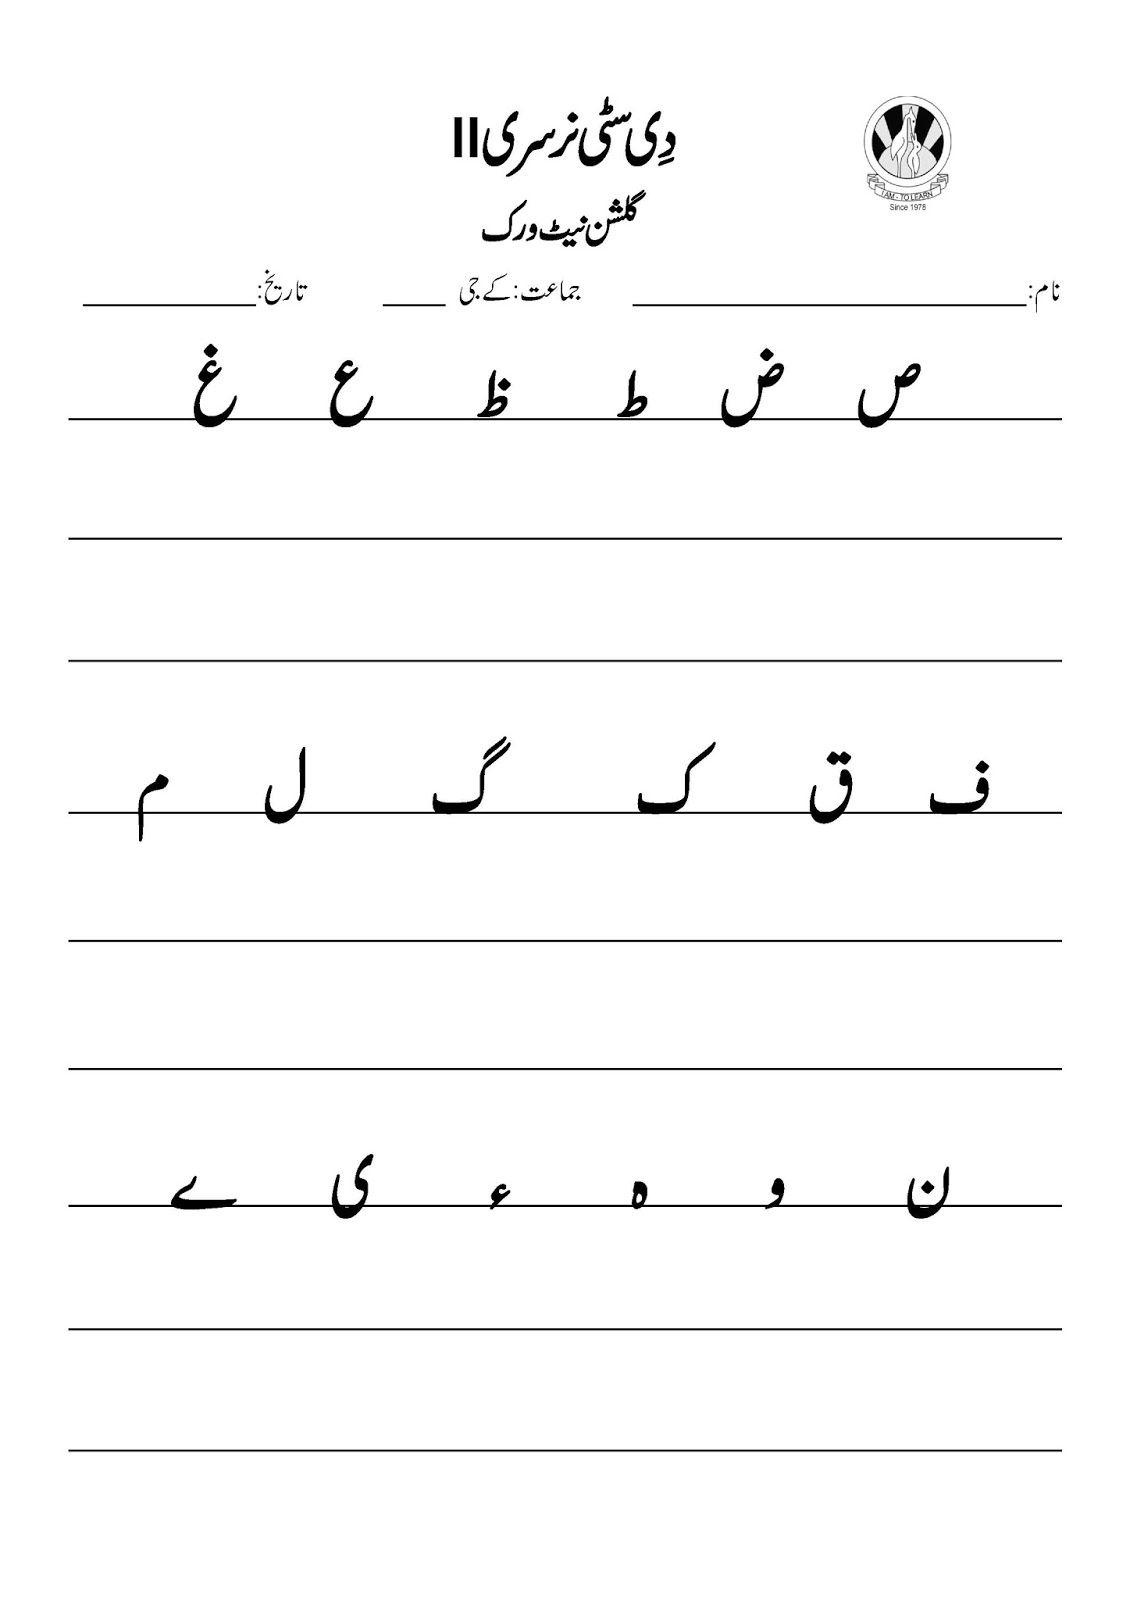 Sr Gulshan The City Nursery-Ii: Urdu First Term | Preschool